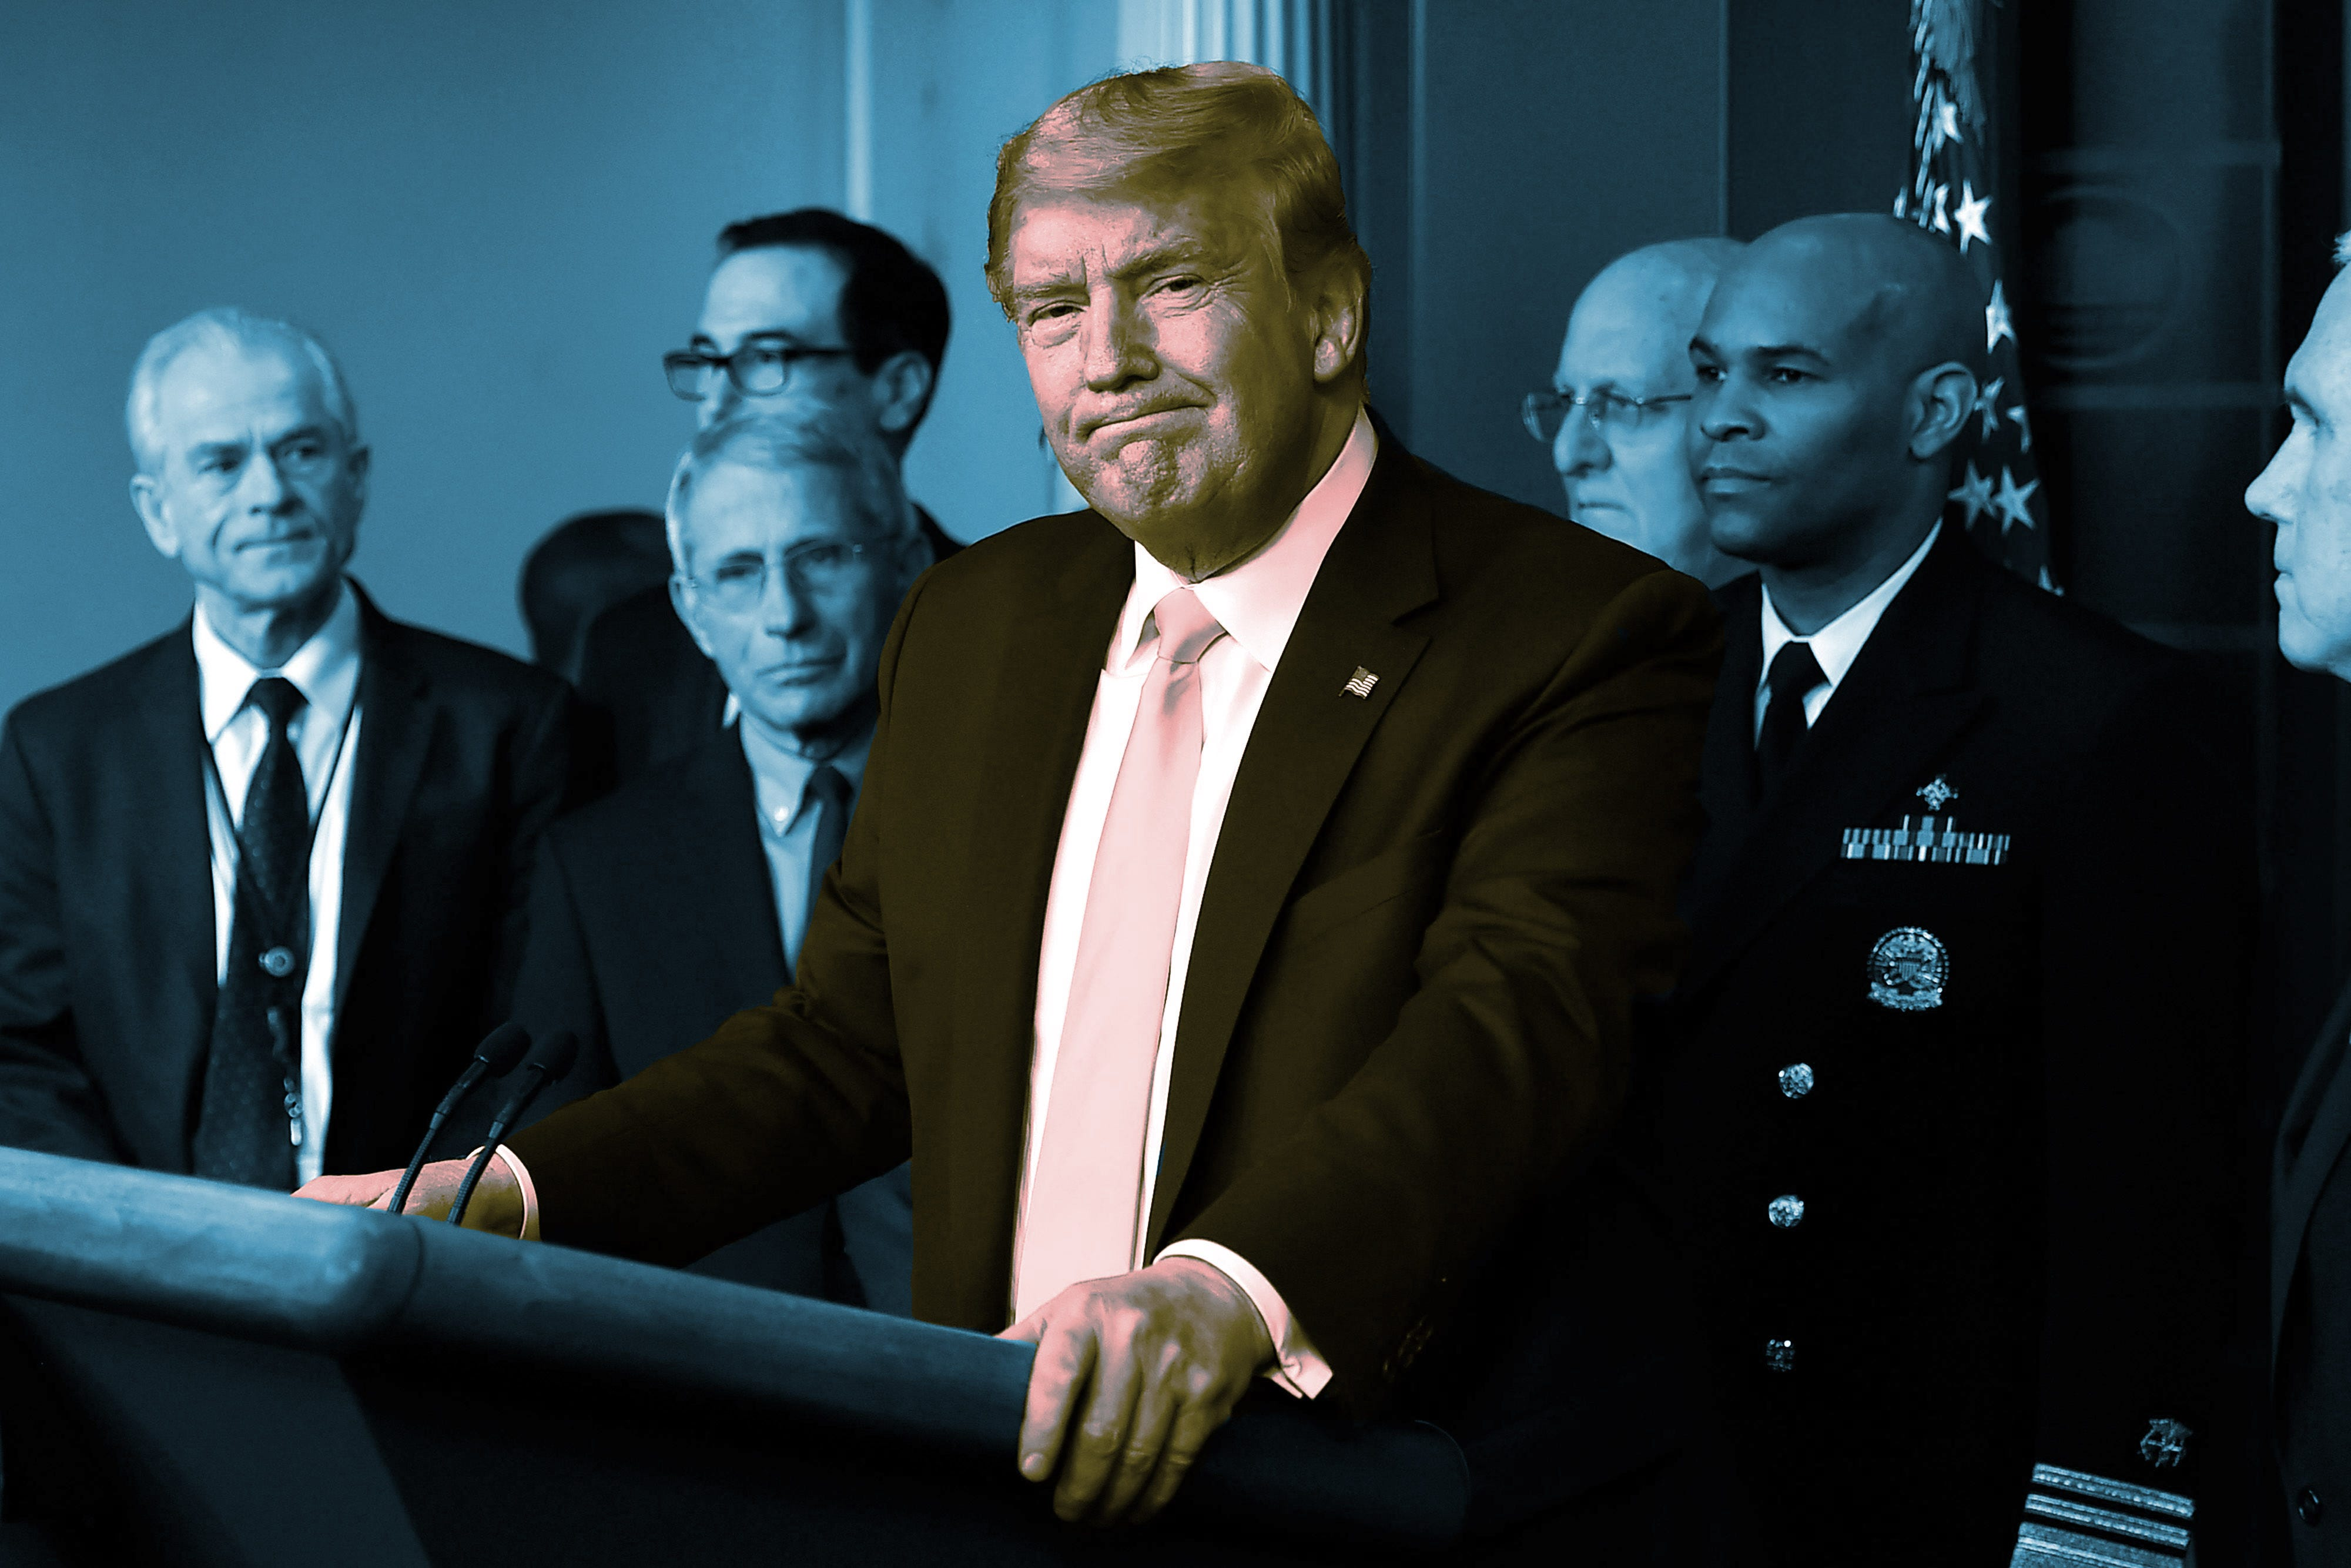 Trump speaking to press